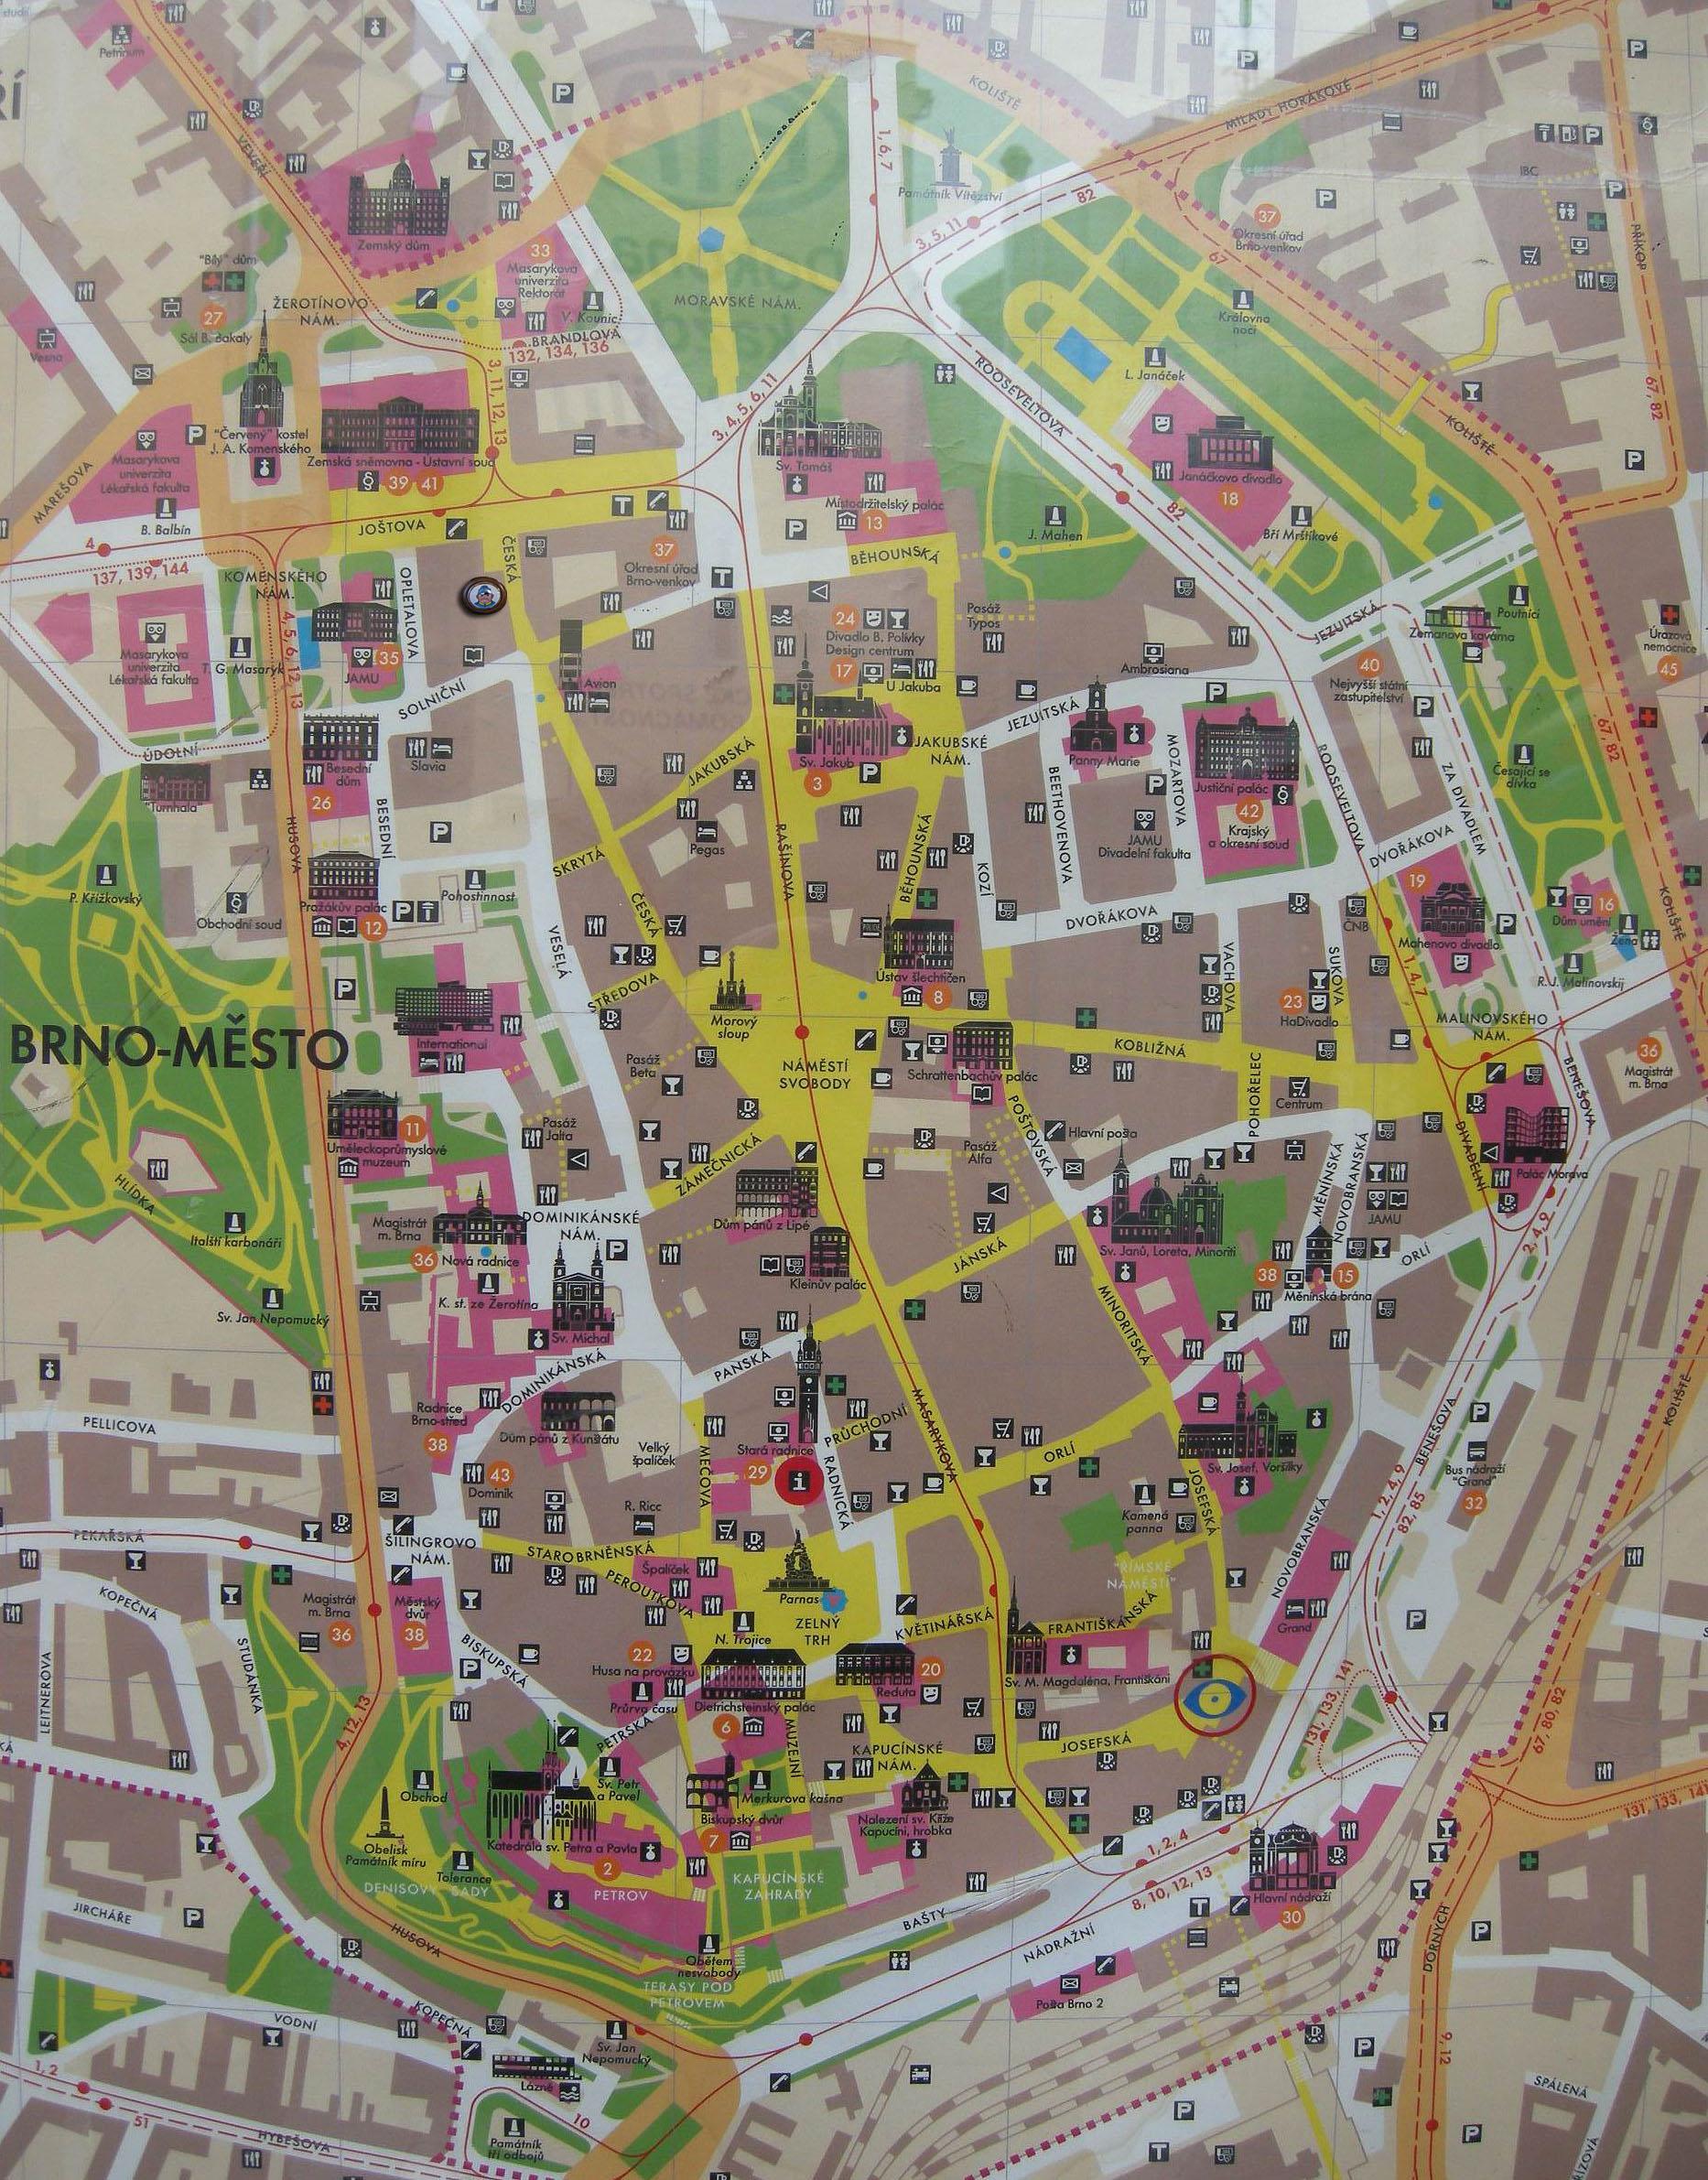 brno térkép Poemas del río Wang: Švejk in Brno brno térkép